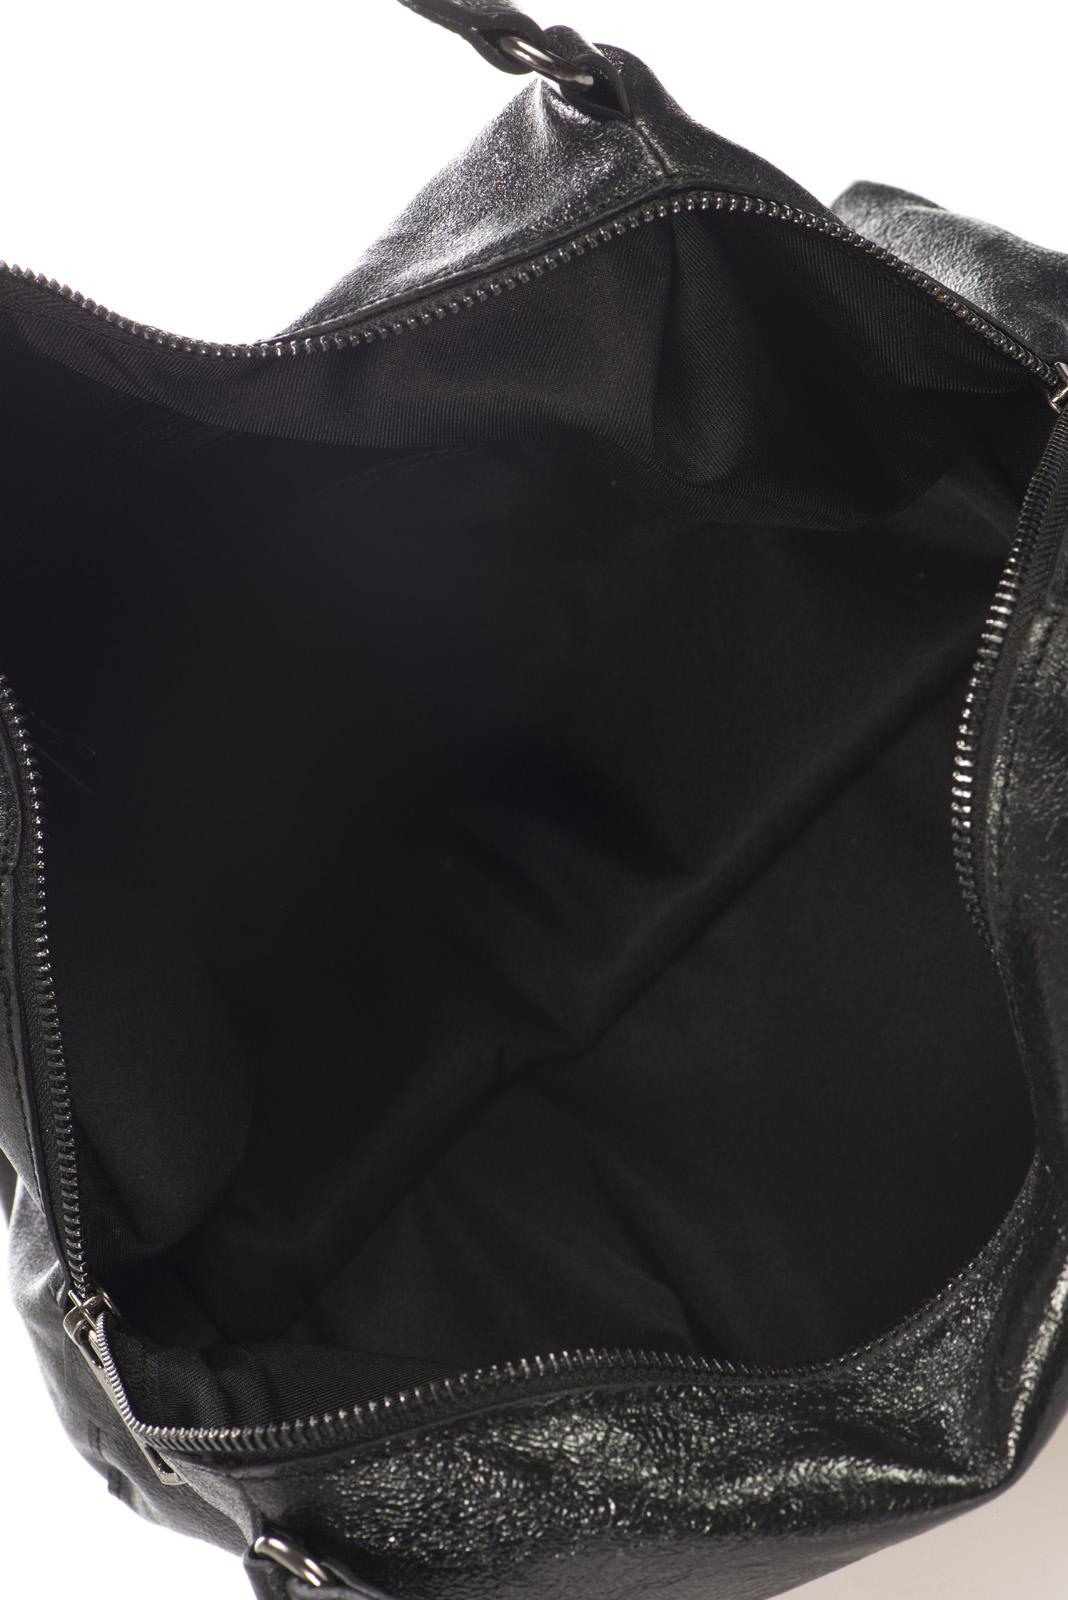 KR17009-BLACK-4.jpg